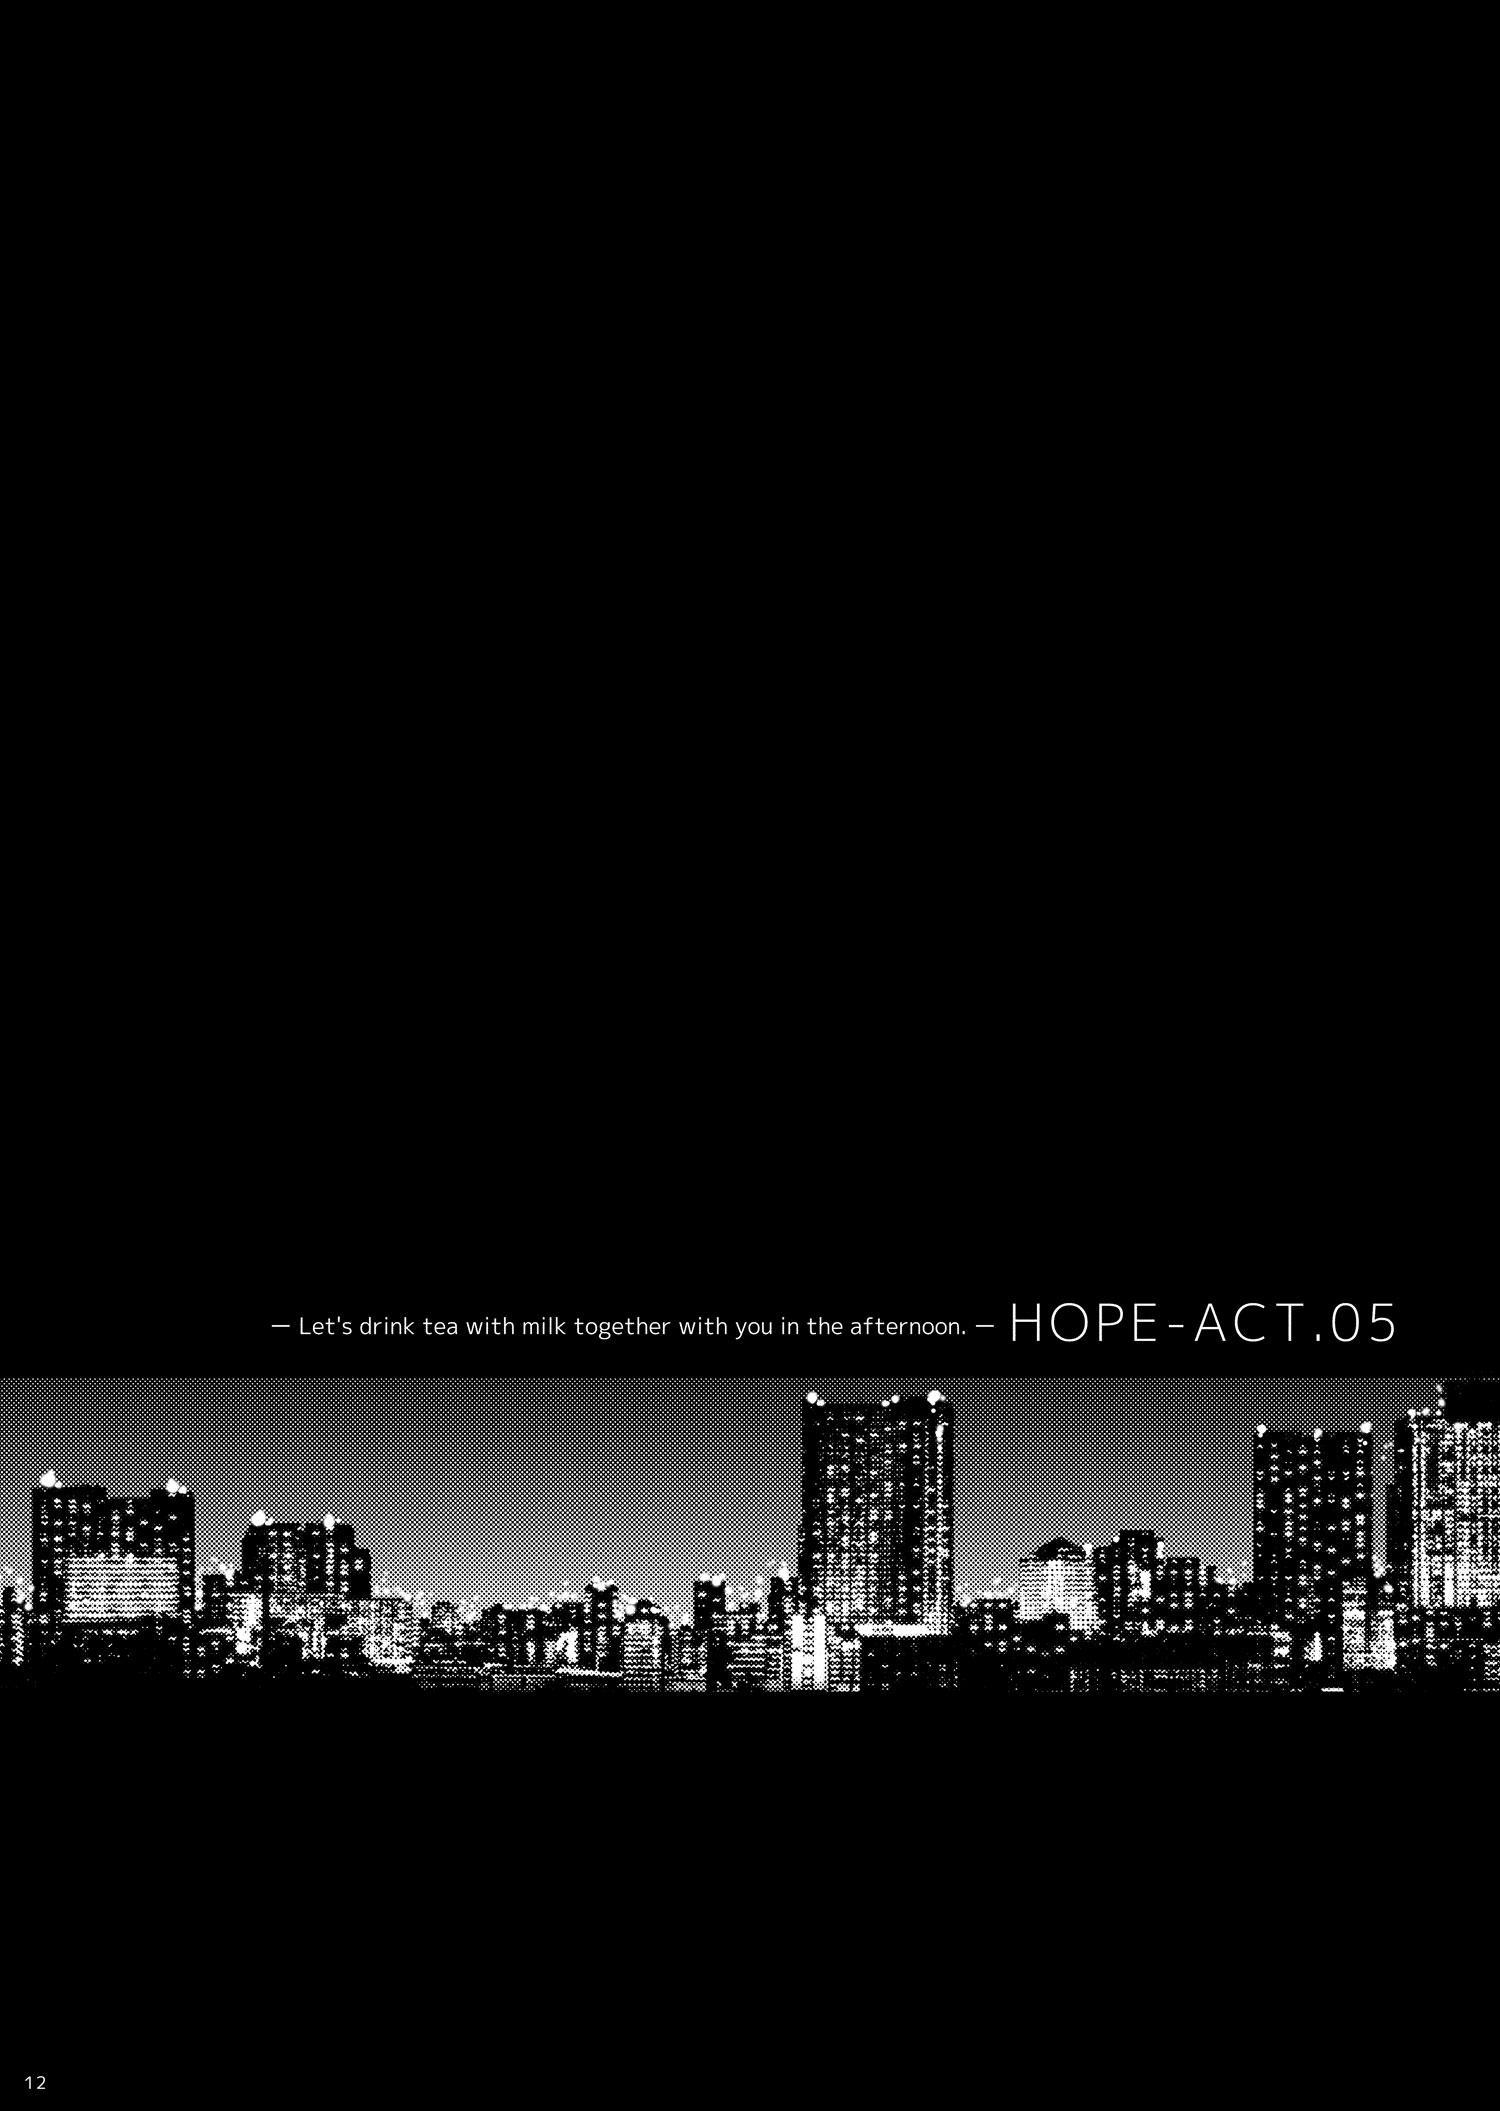 HOPE-ACT. 05 11